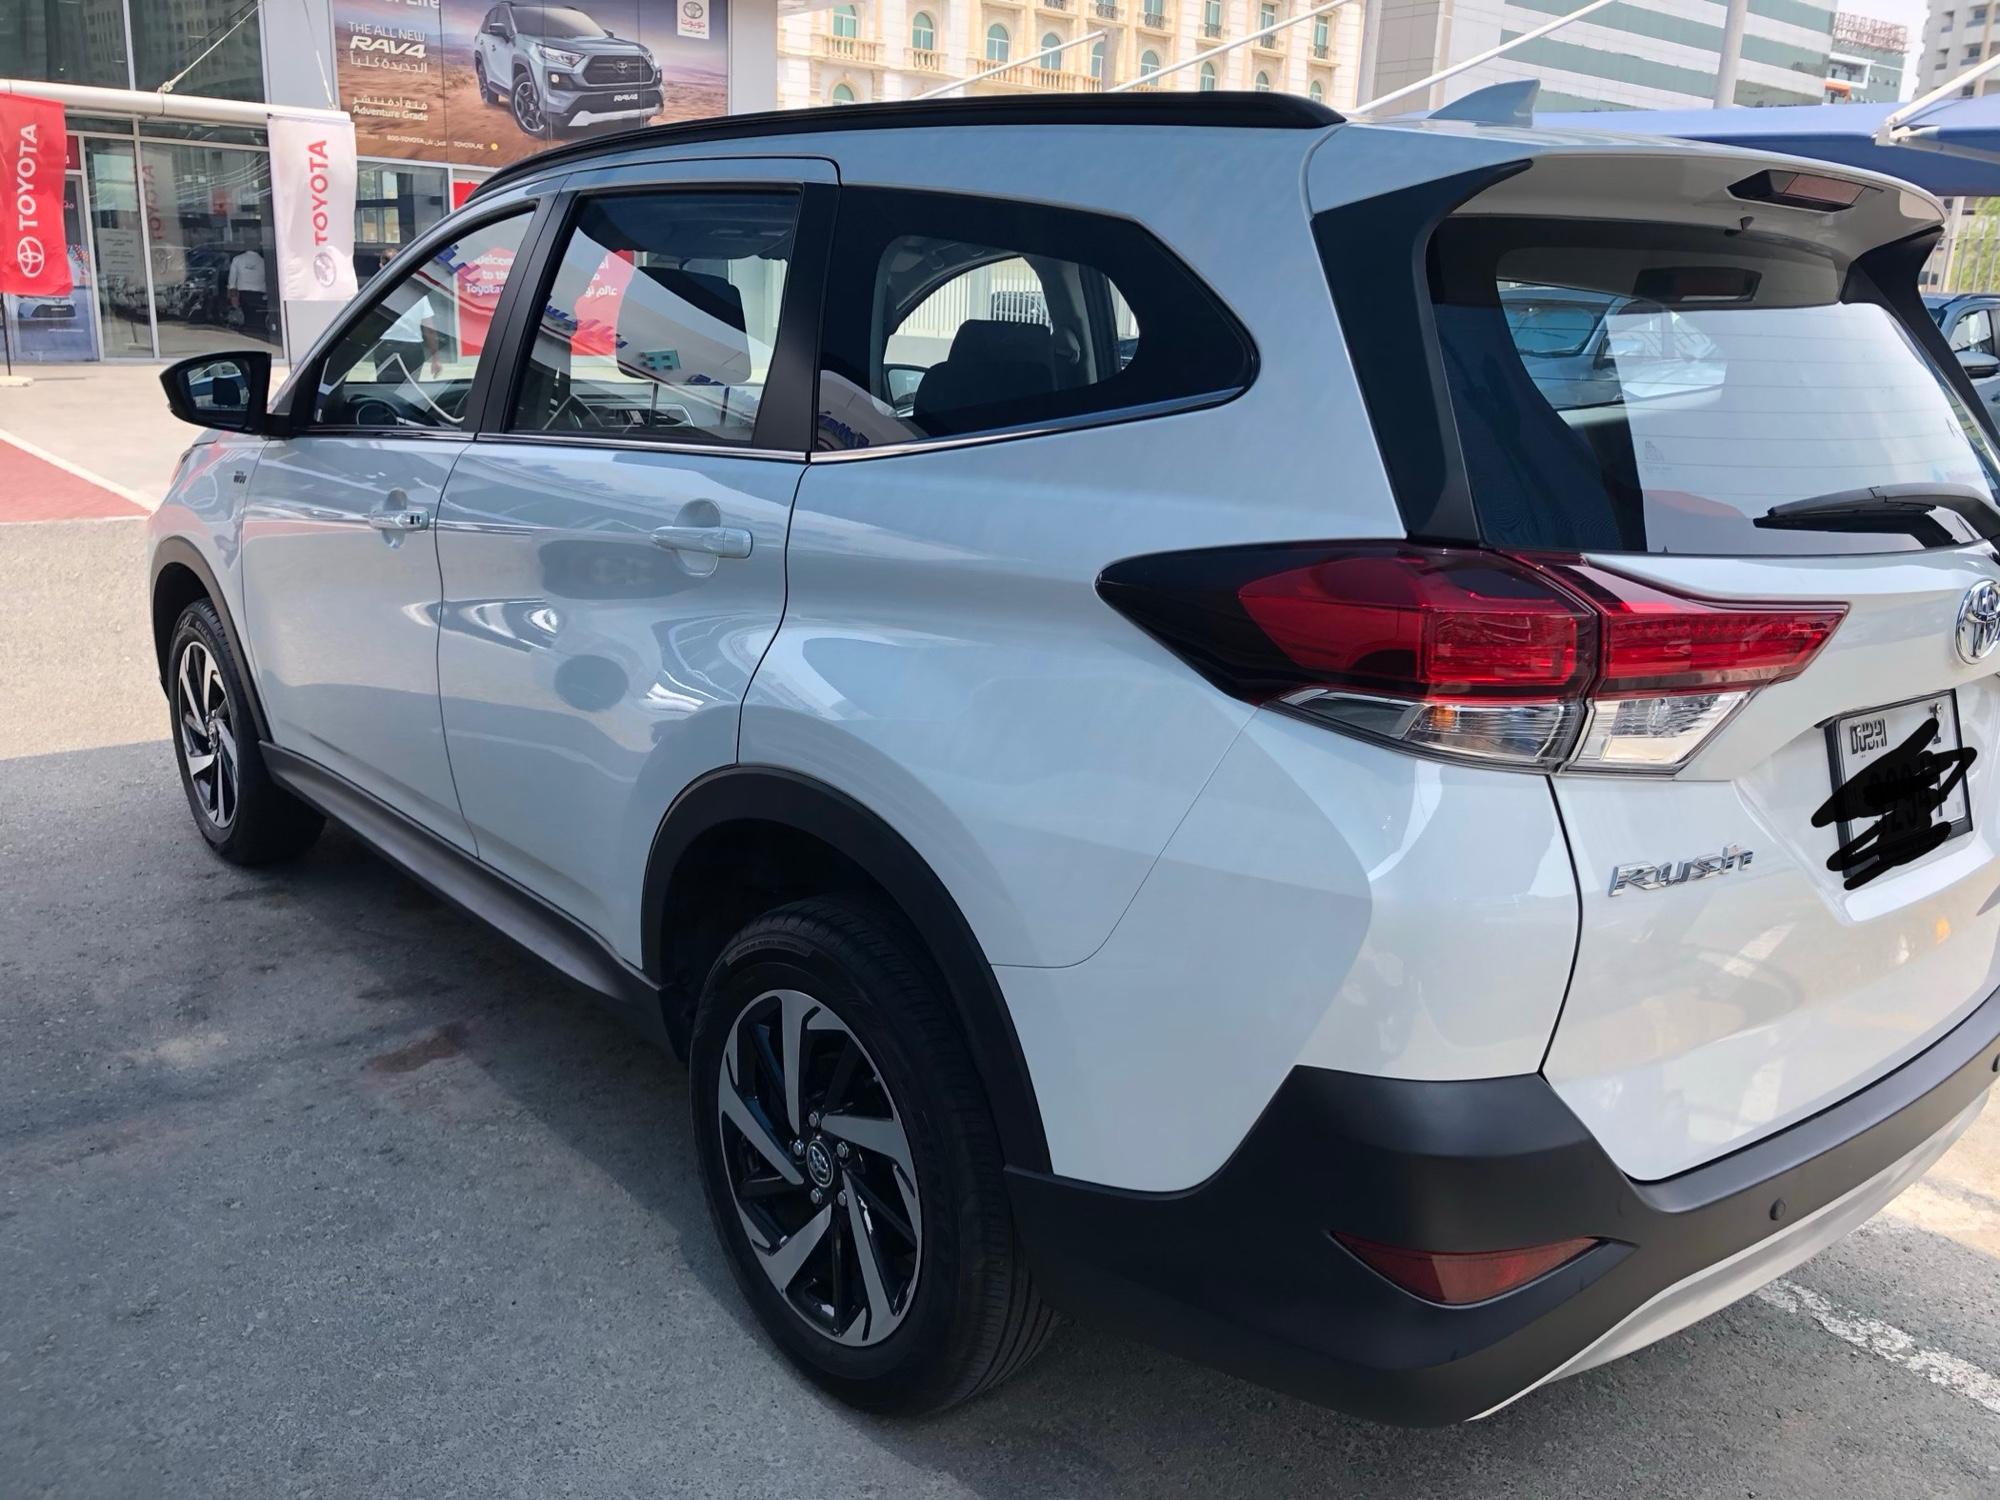 Kekurangan Toyota Rush 2020 Perbandingan Harga